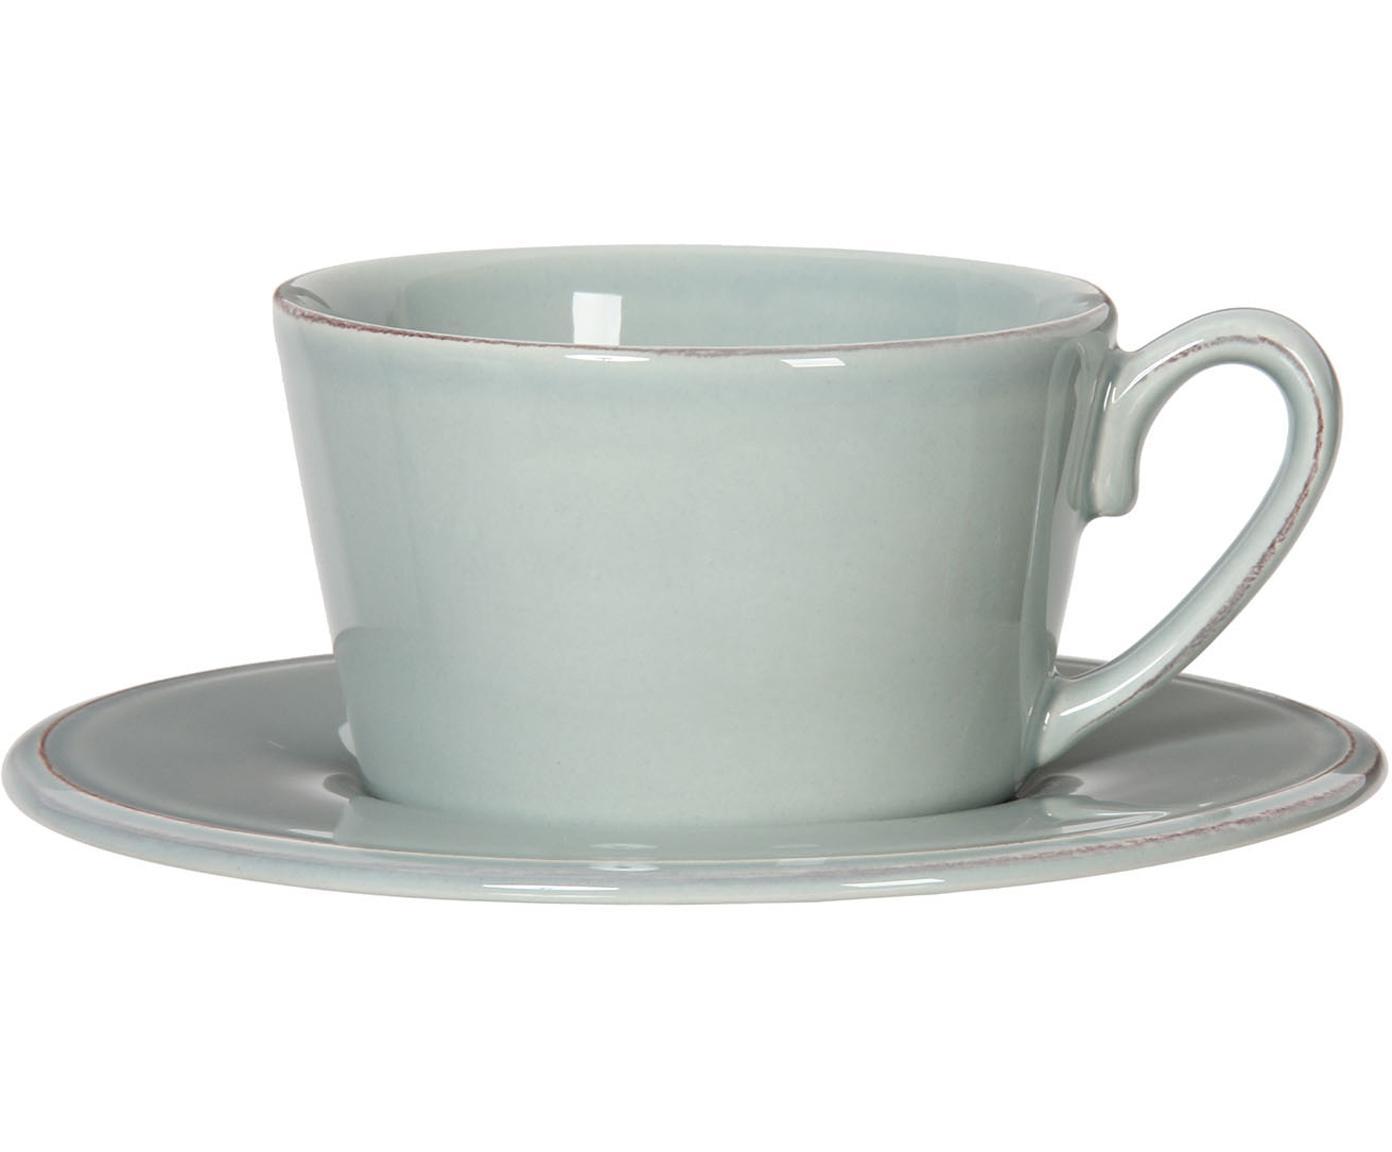 Tazza da tè con piattino Constance, Terracotta, Verde menta, Ø 19 x Alt. 8 cm